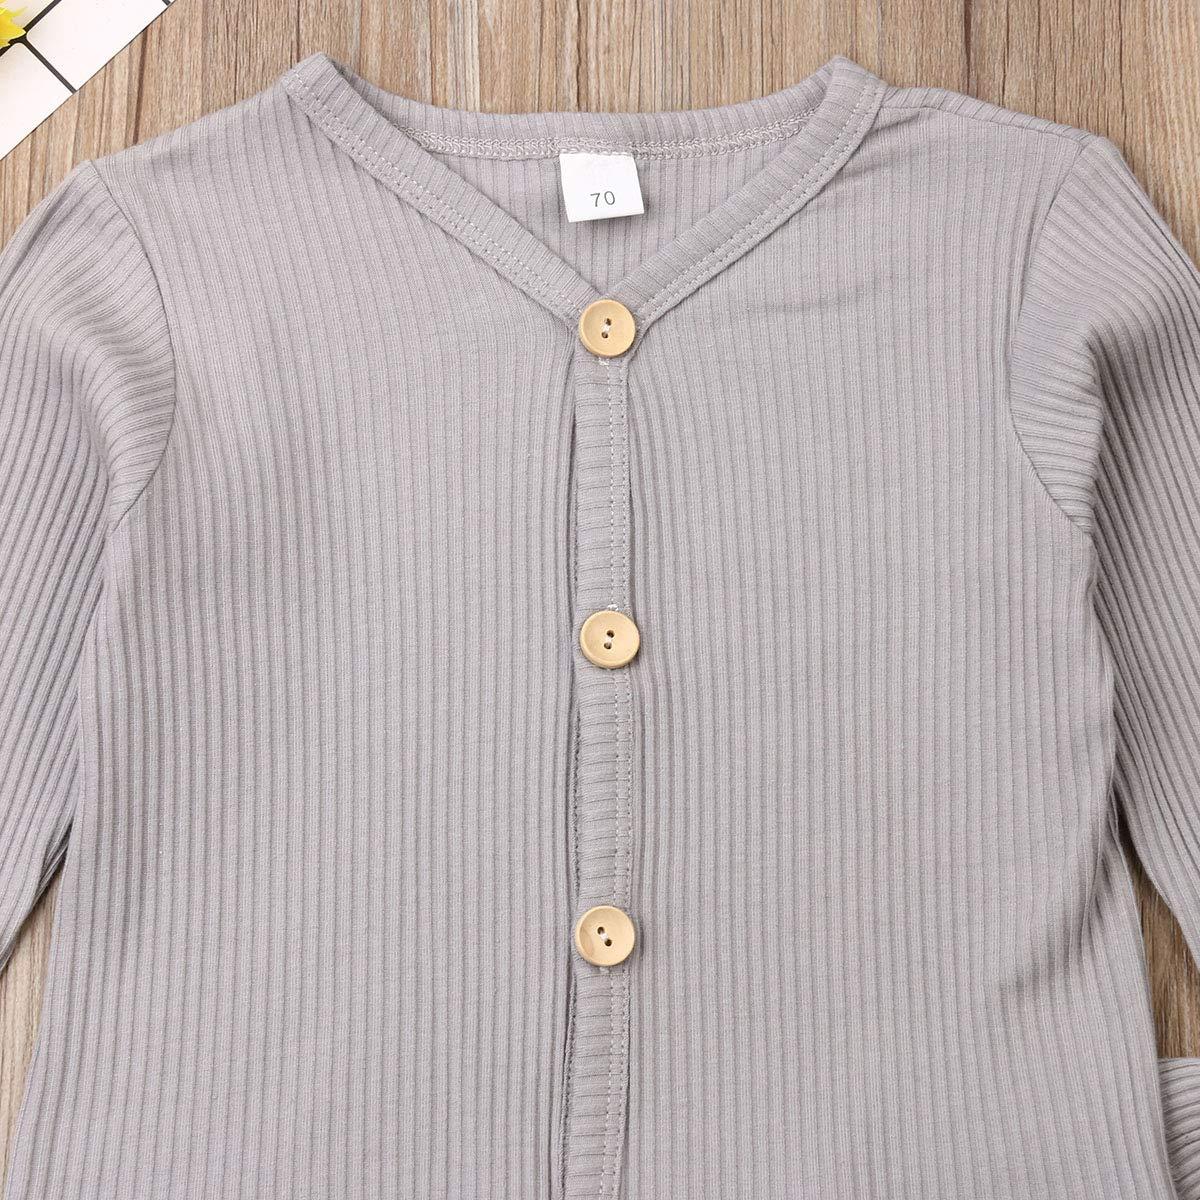 Dourbesty Toddler Boys Girls Gingham Pajama Set Striped Shirts Pants Suits